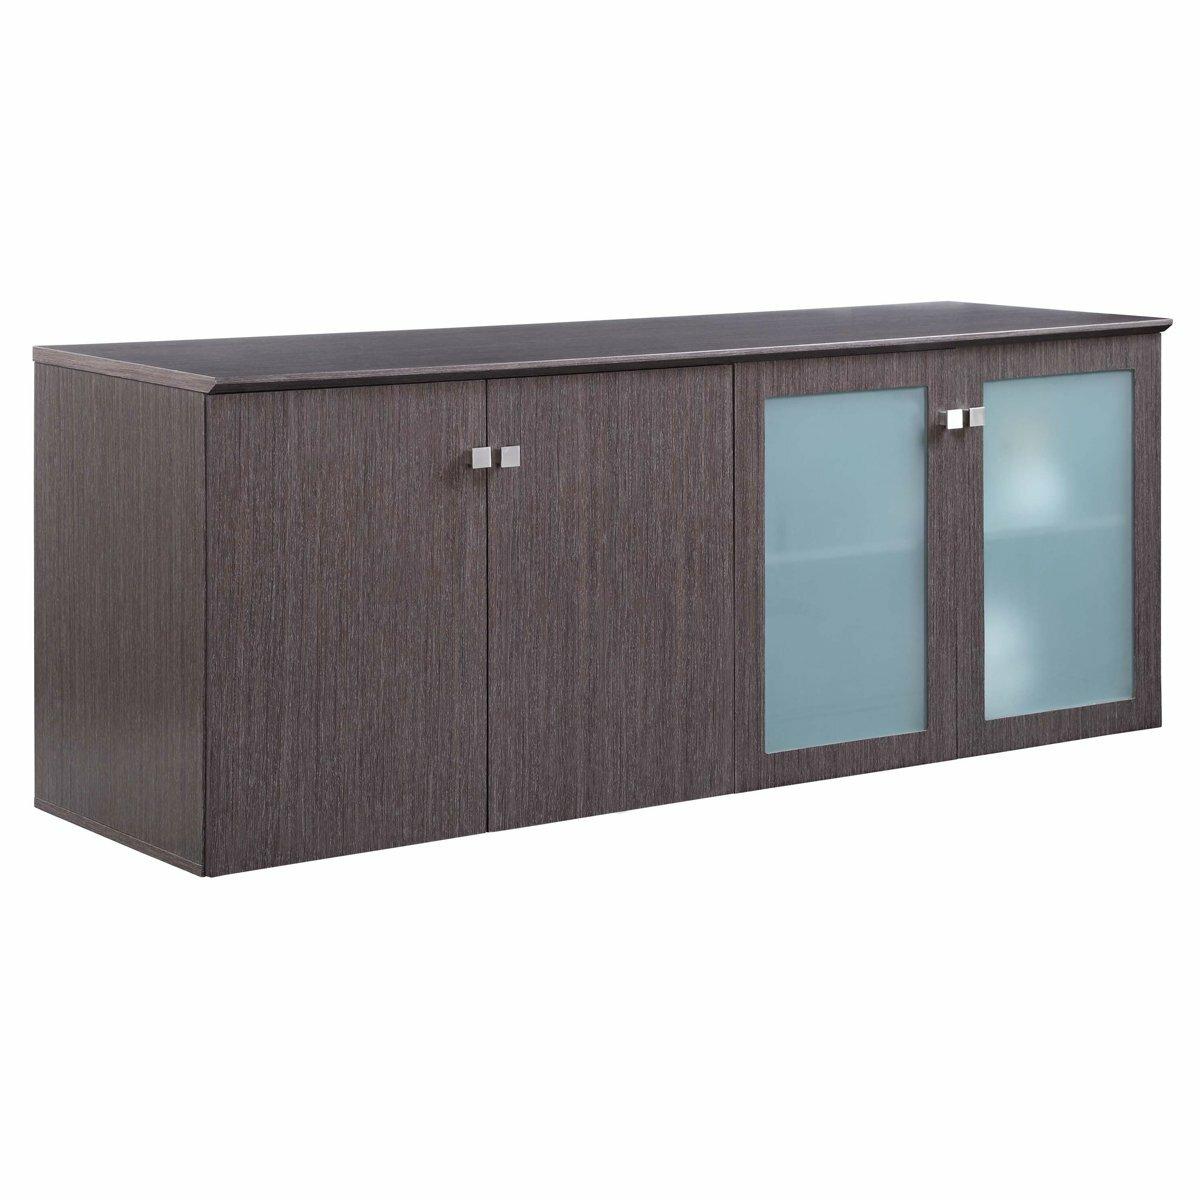 Office Storage 4 Door Credenza Cabinet All Wooden Doors, Mahogany Conference Office Room Credenza 72